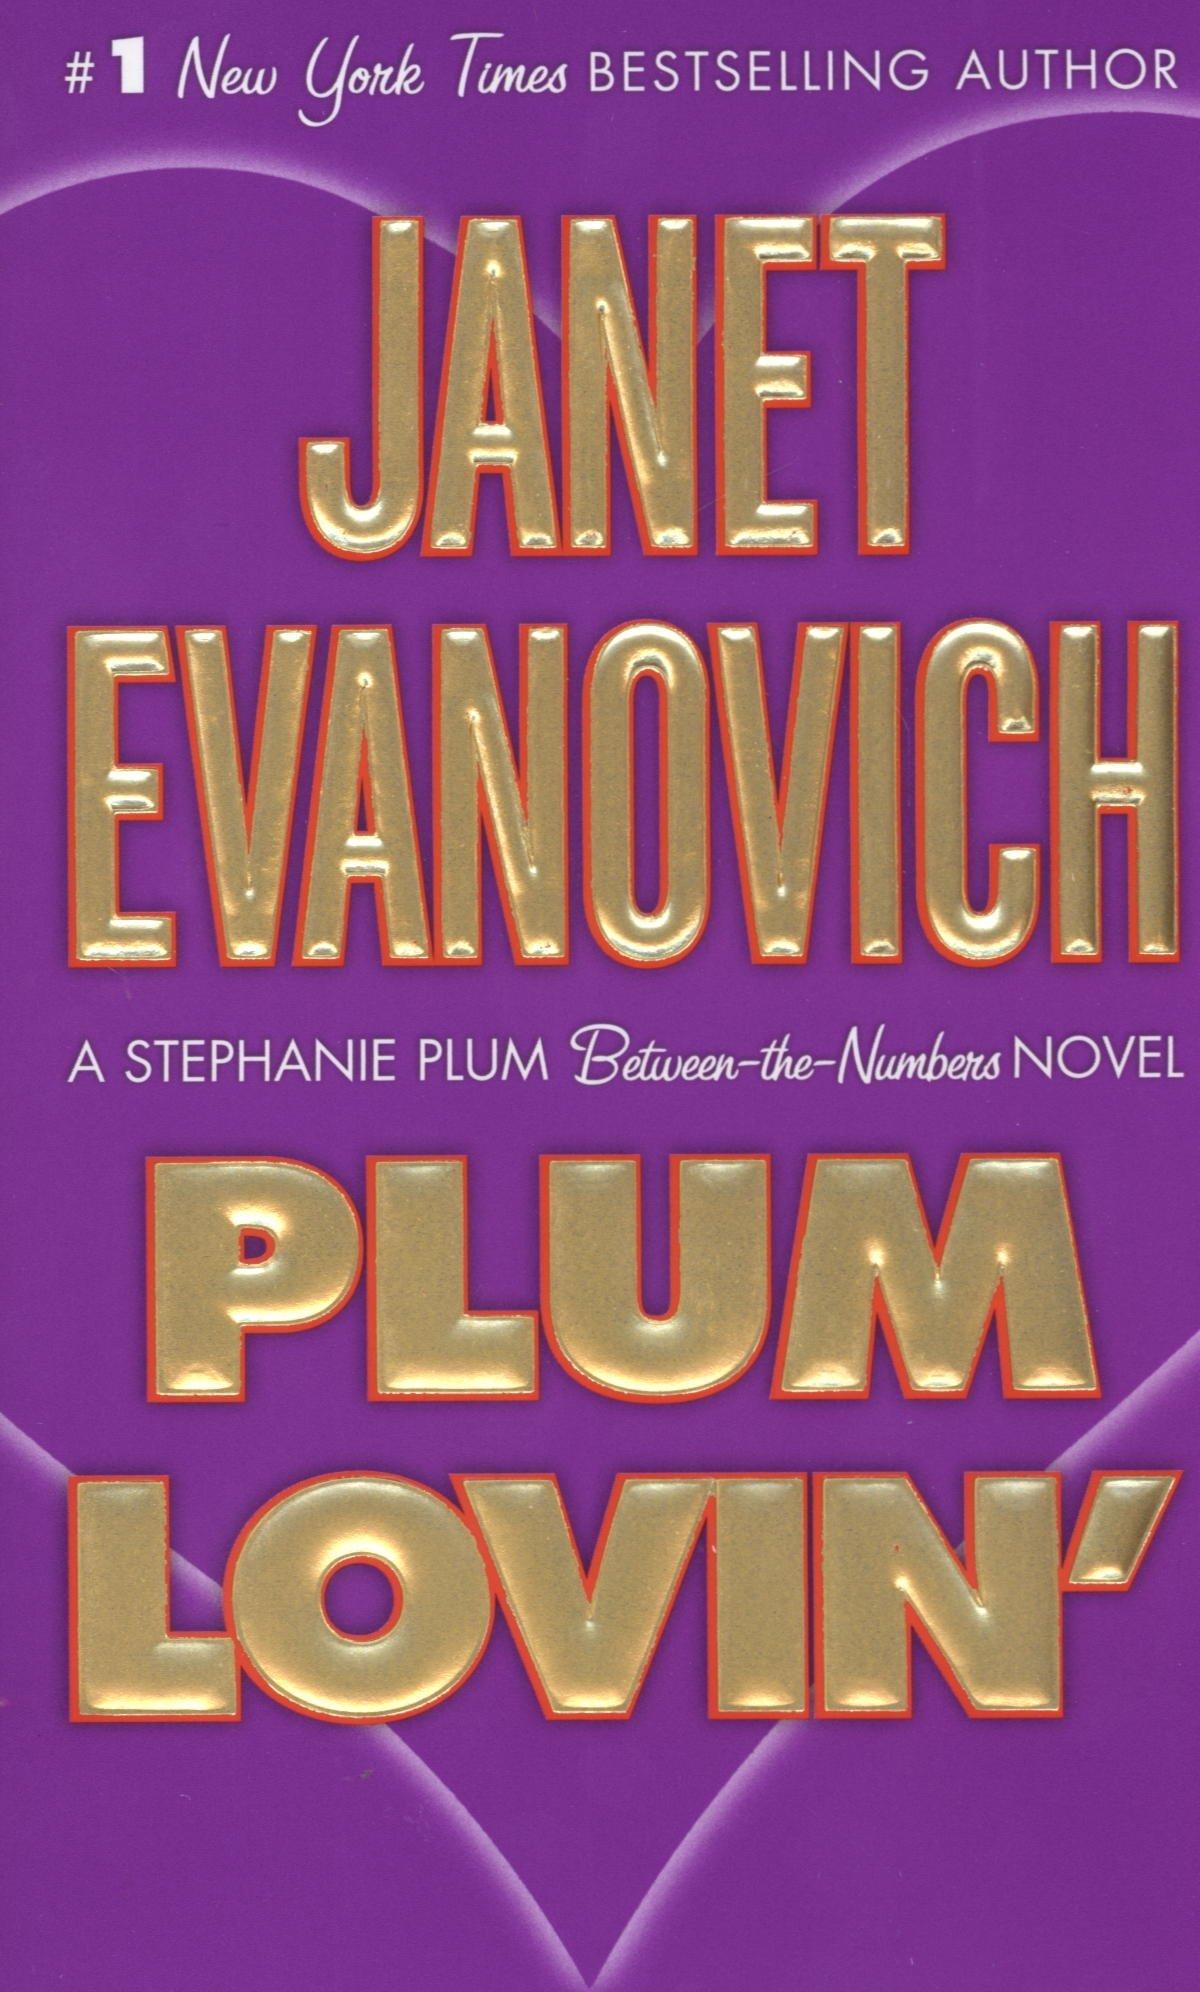 Plum Lovin': A Stephanie Plum Between The Numbers Novel: Janet Evanovich:  9780312985363: Amazon: Books